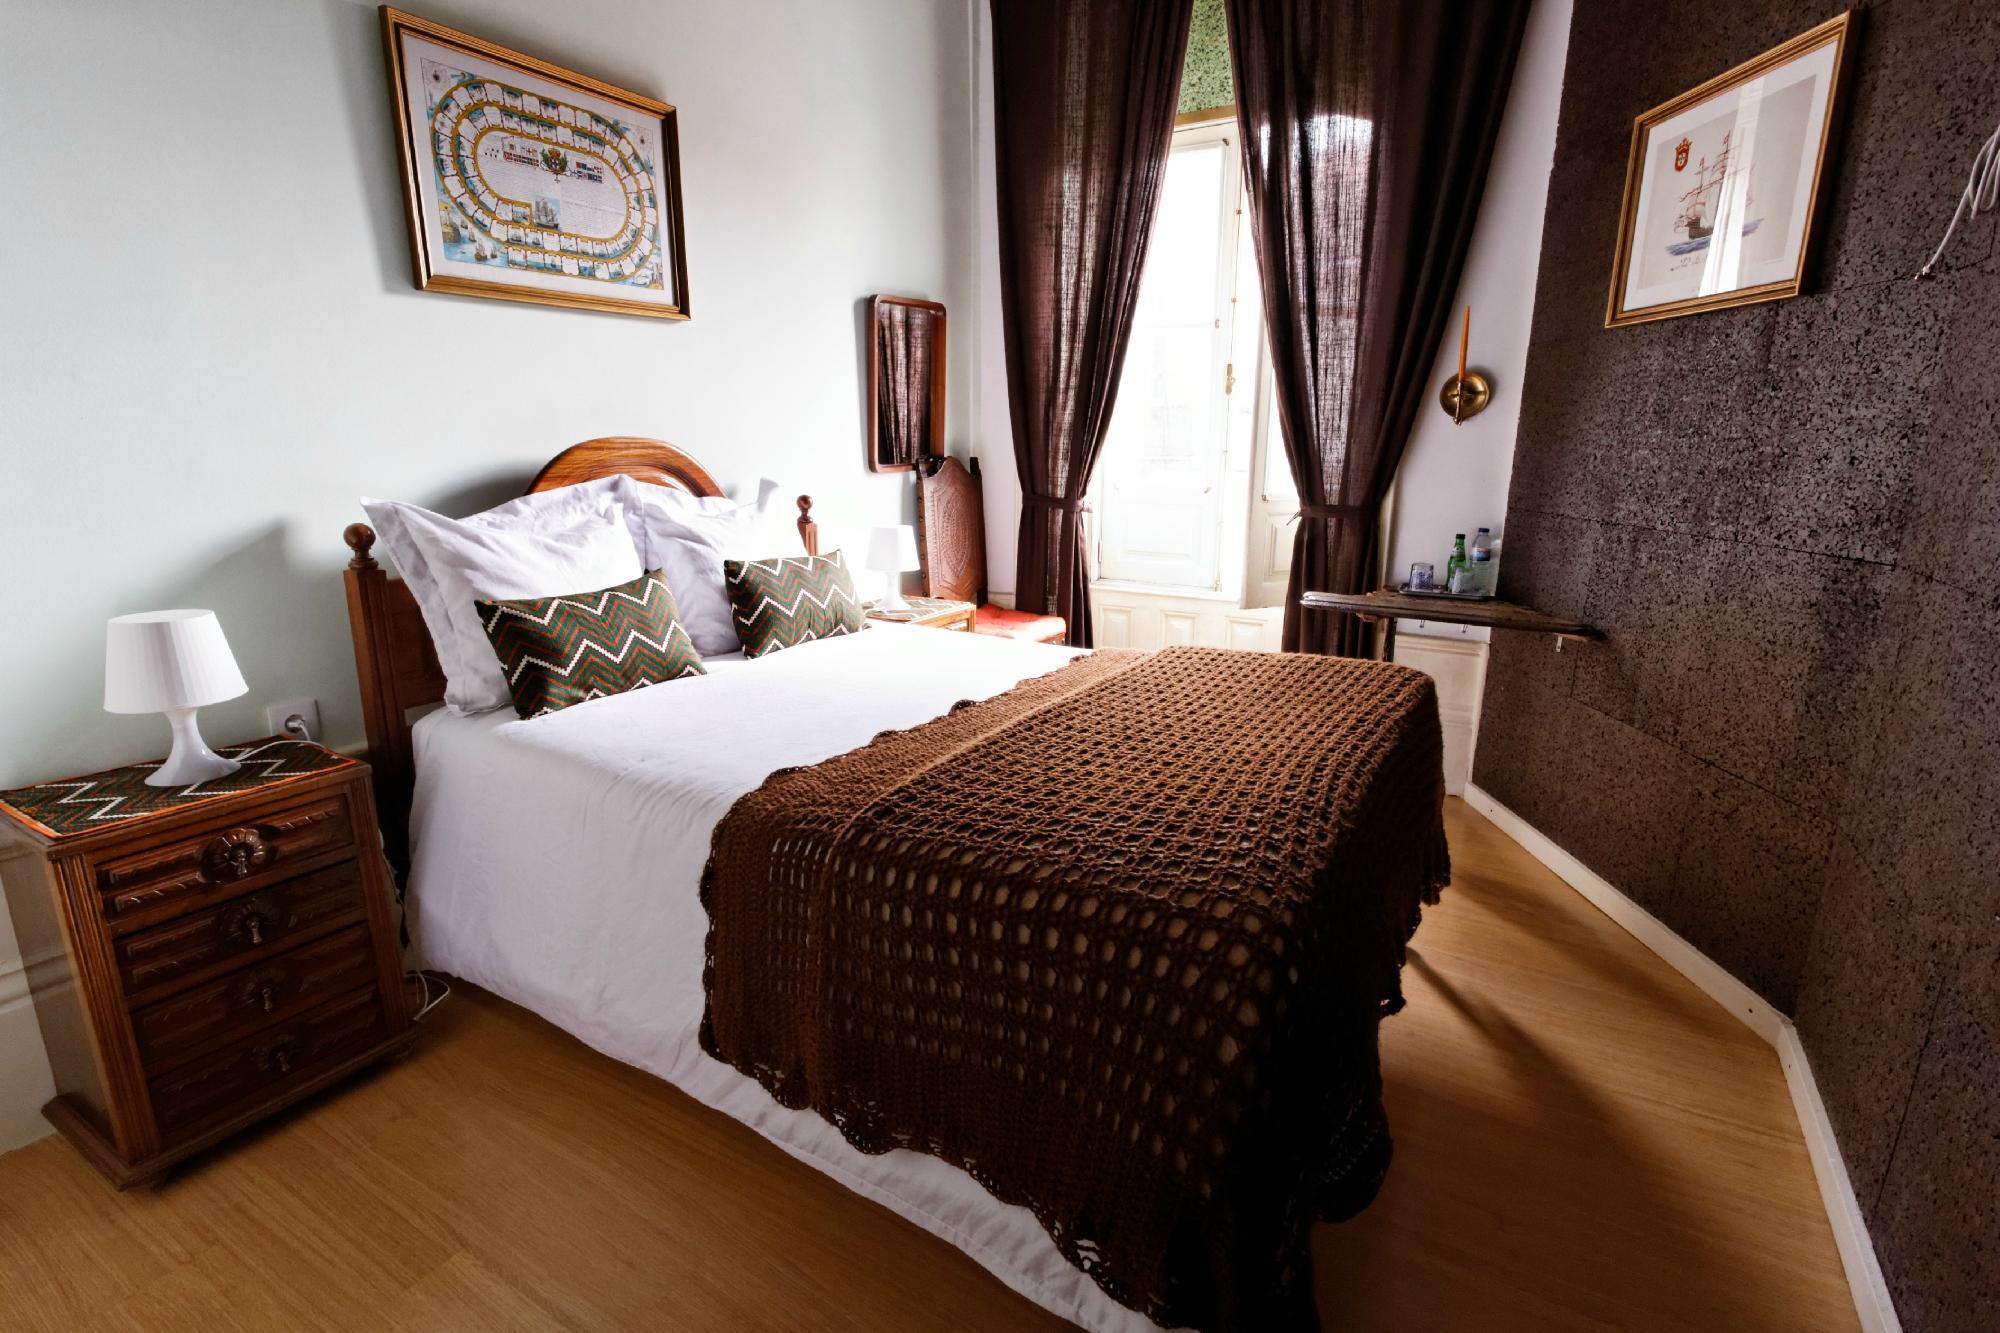 Alvares Cabral Guest House